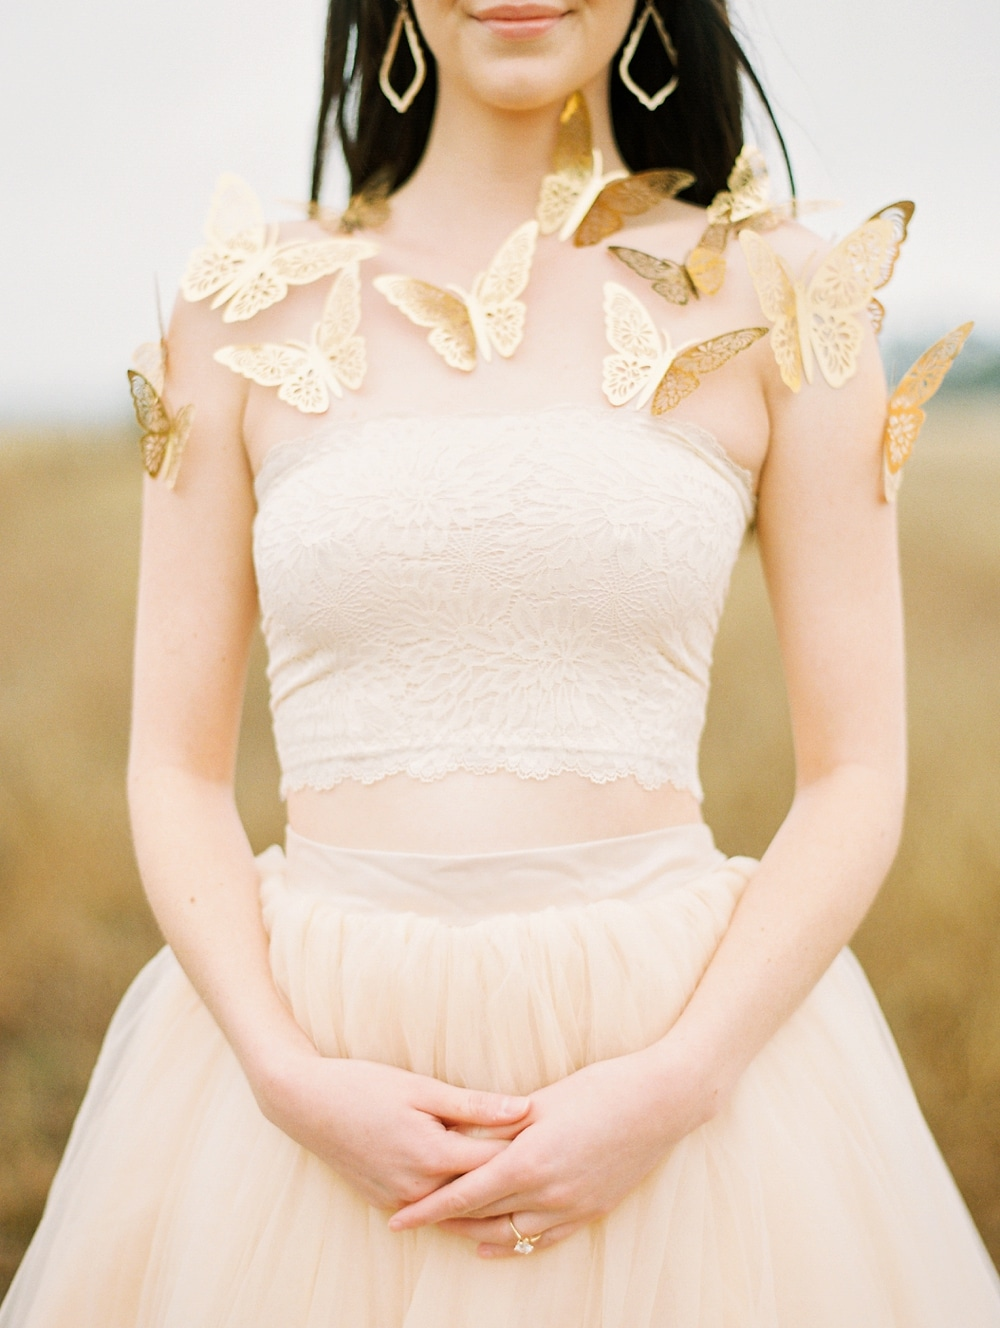 Kristin-La-Voie-Photography-fine-art-wedding-bridal-boudoir-texas-photographer-Dallas-Austin-San-Marcos-wahwahtaysee-resort-31